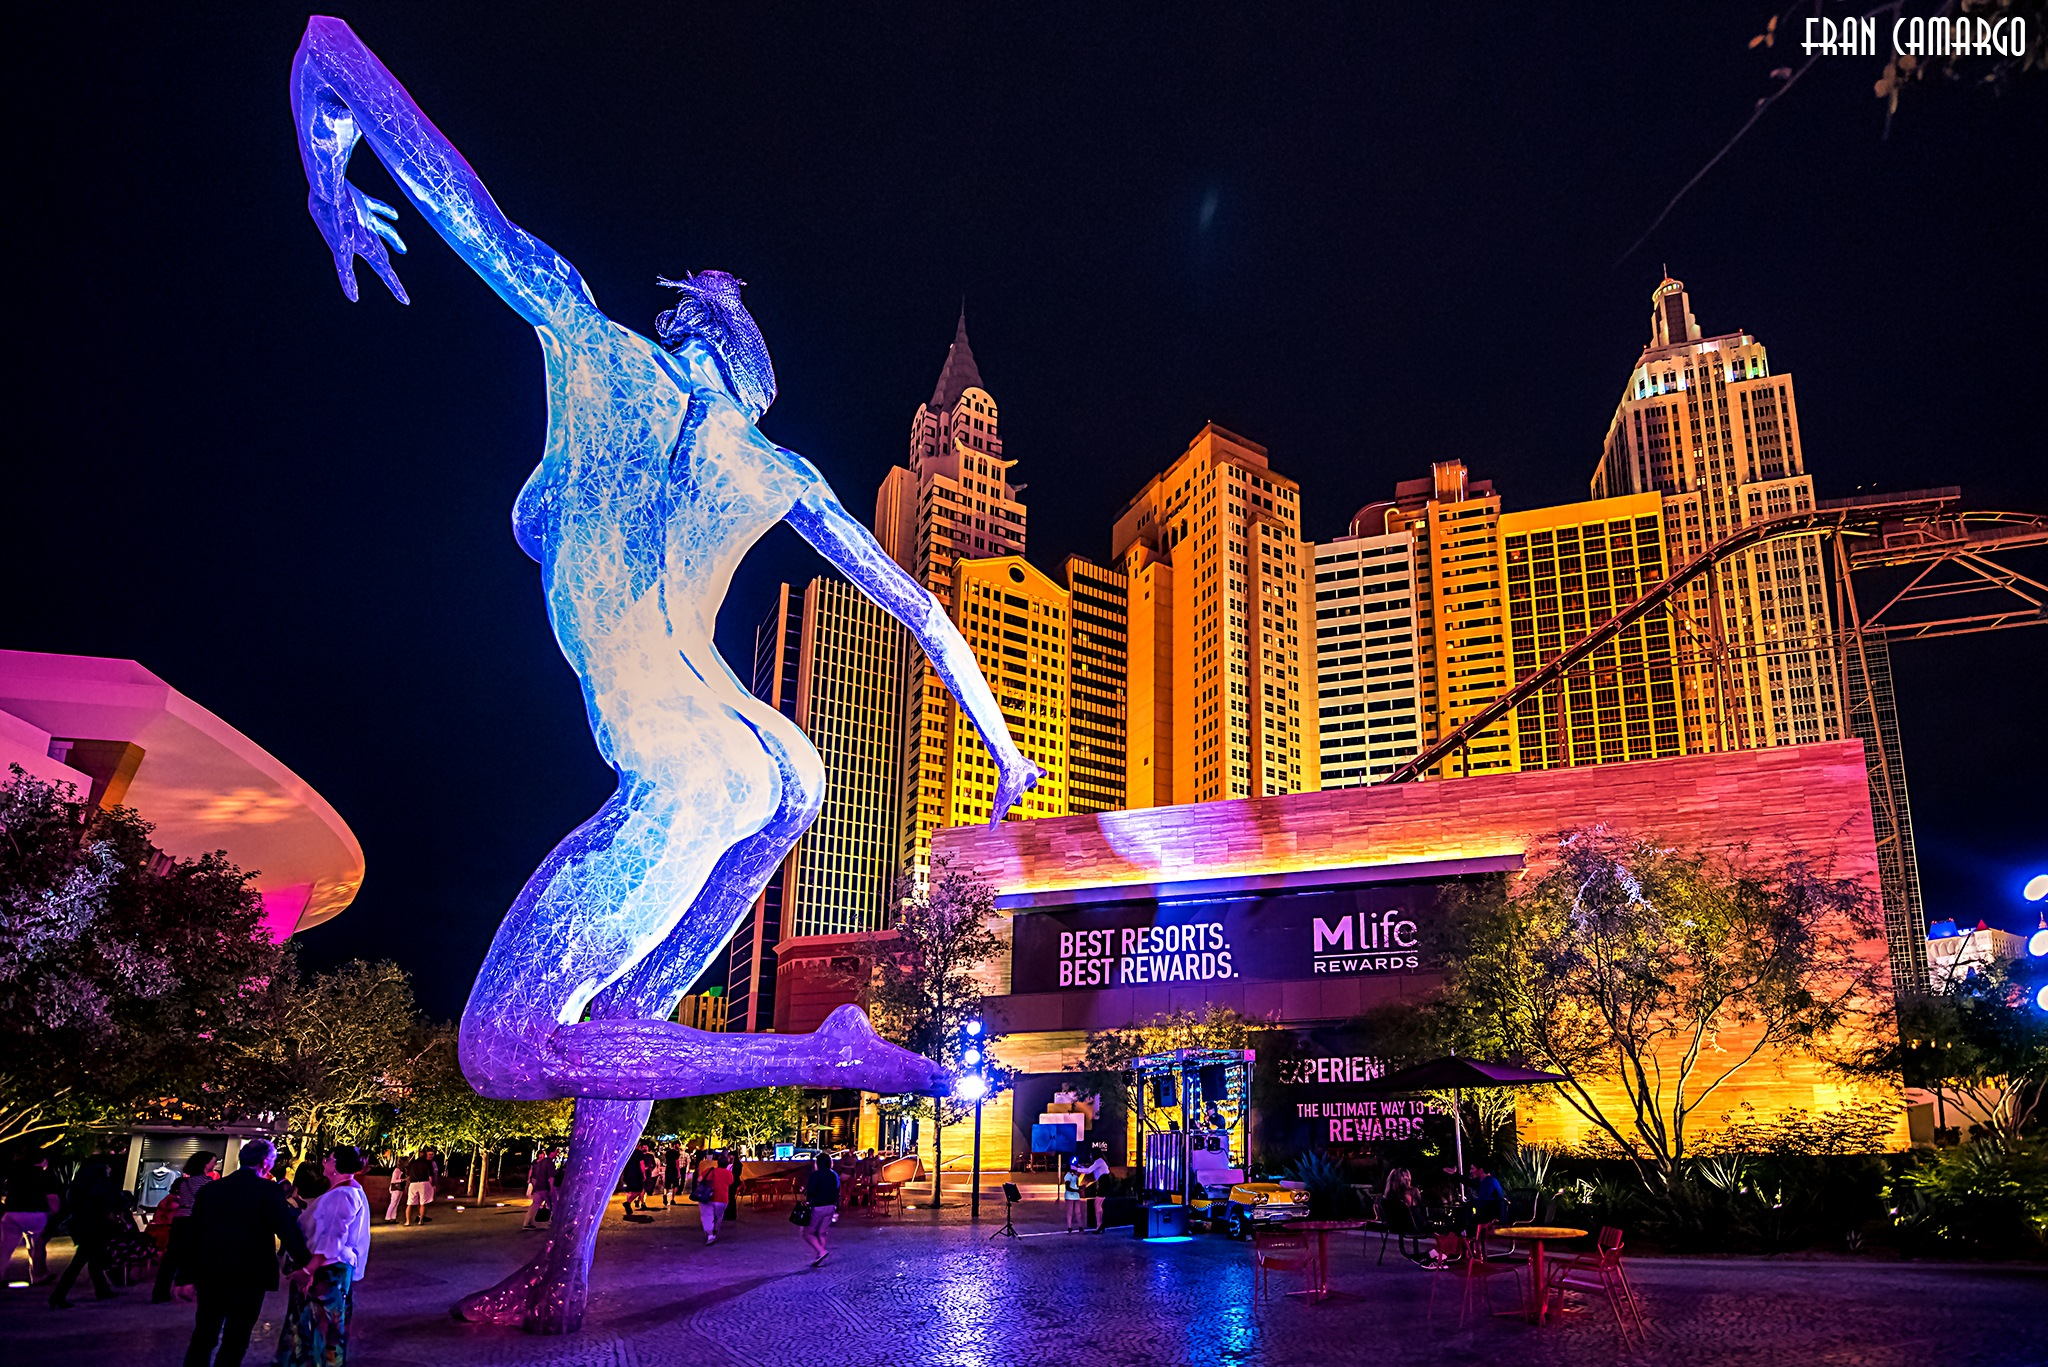 Las Vegas by Fran Camargo